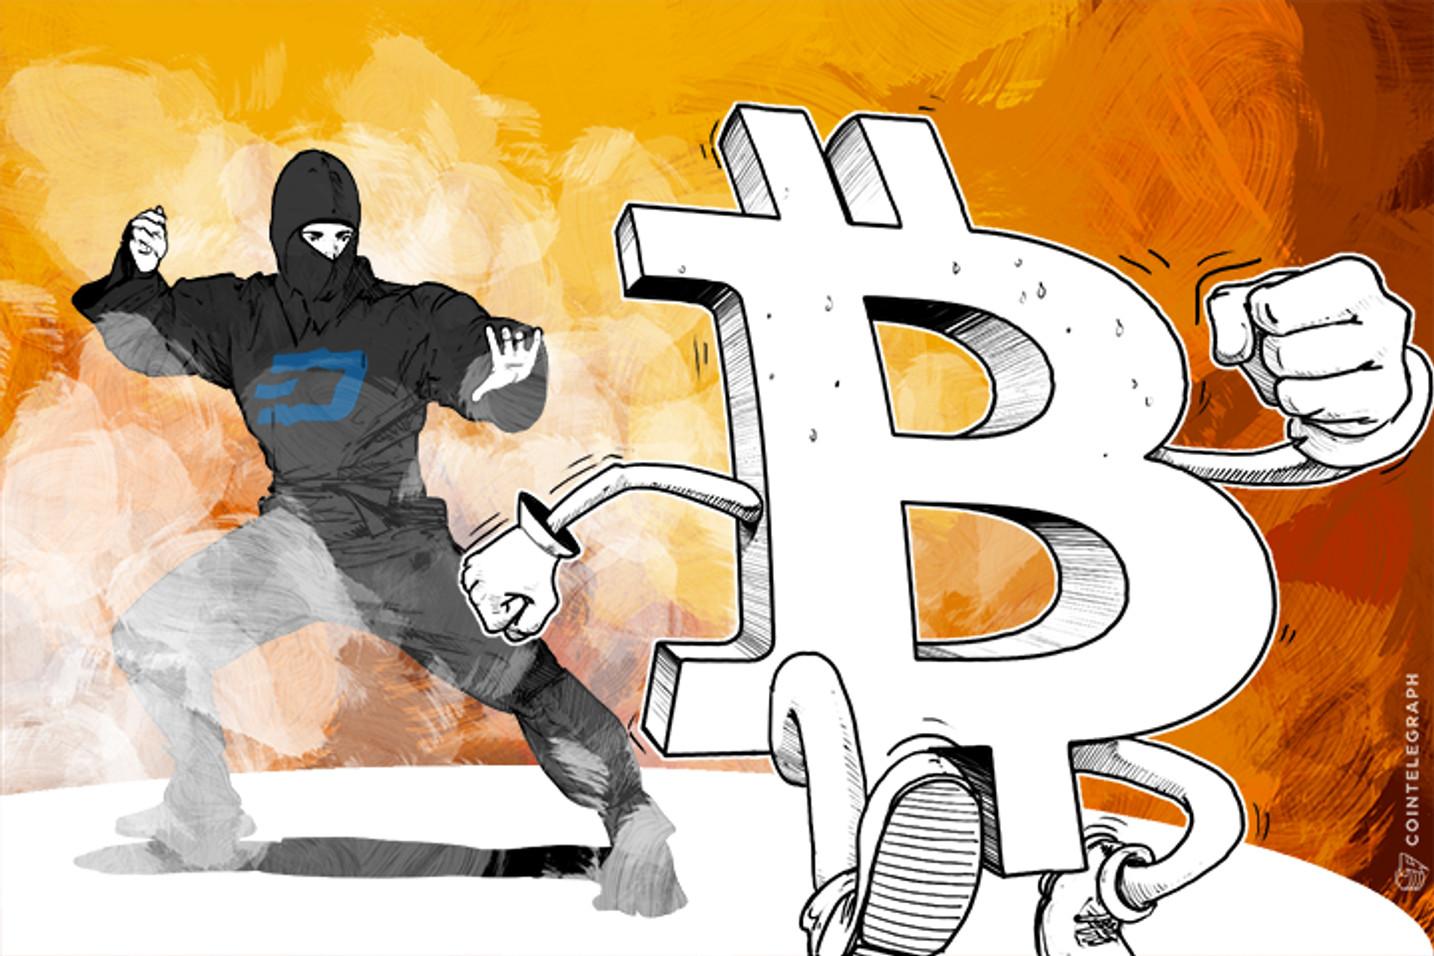 Bitcoin Violates the Principle of Fungibility (Op-Ed)